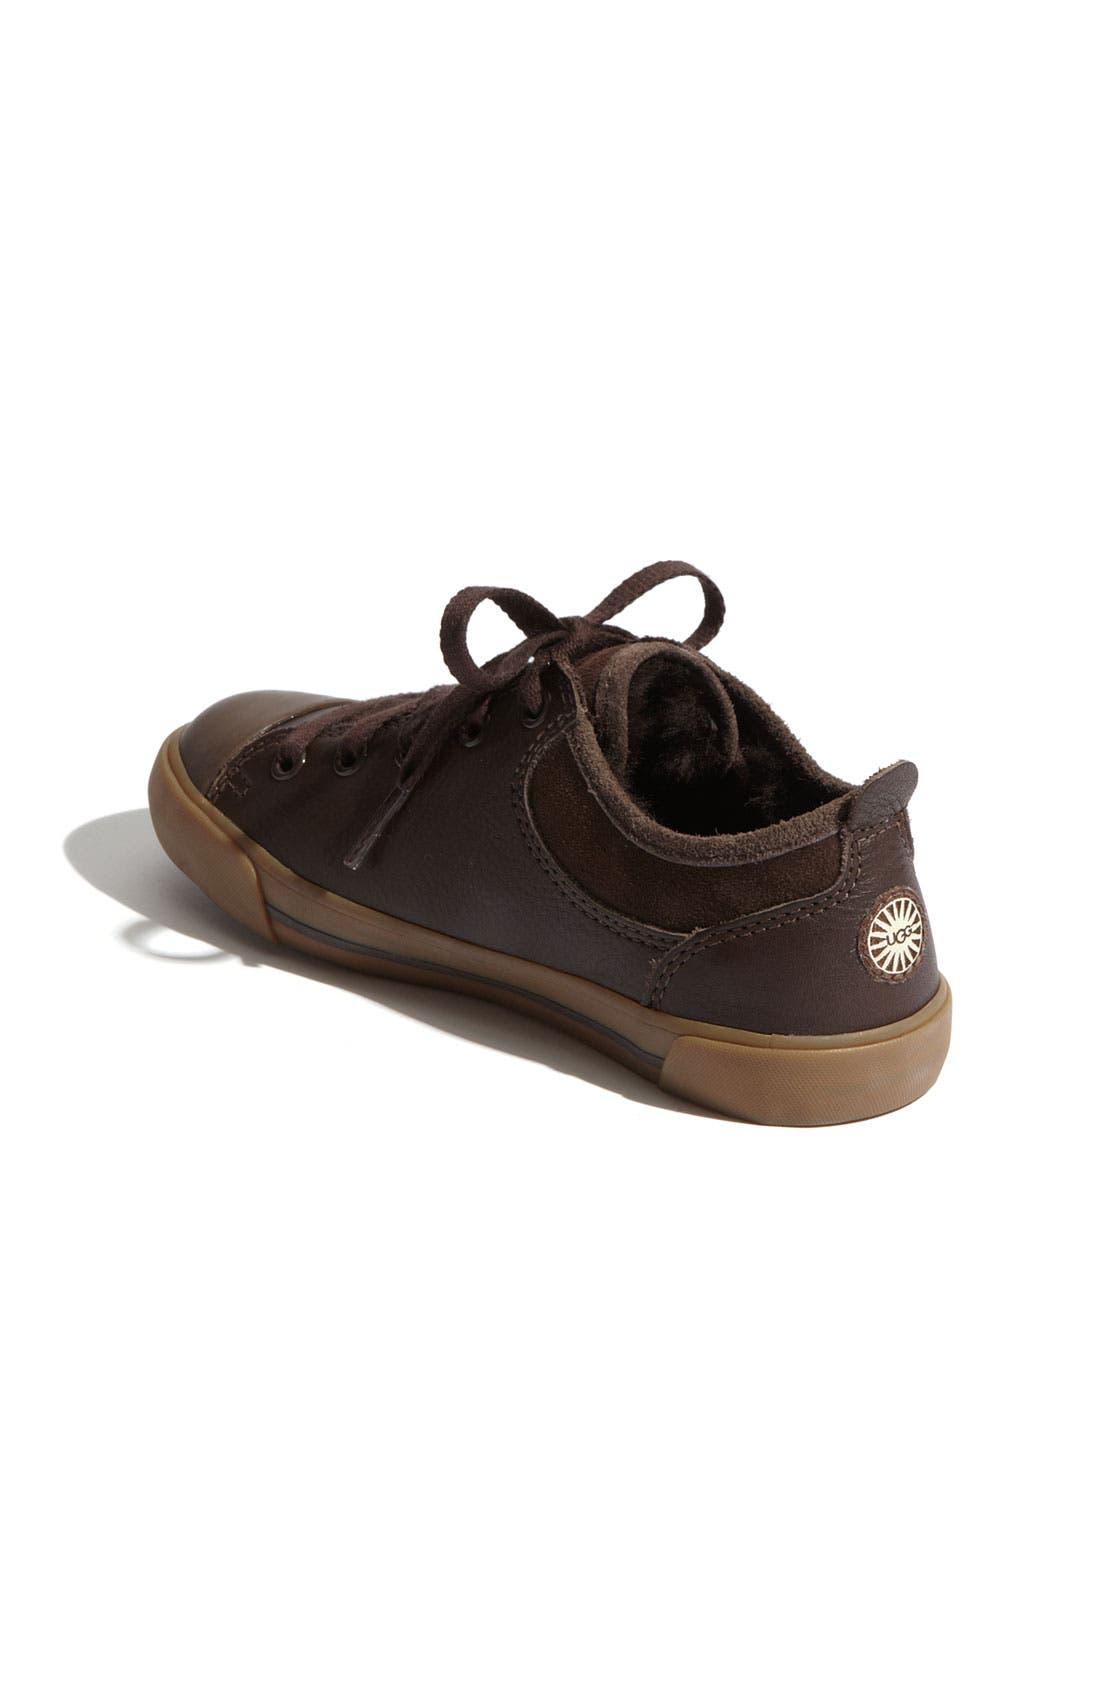 Alternate Image 2  - UGG® Australia 'Kameron' Sneaker (Toddler, Little Kid & Big Kid)